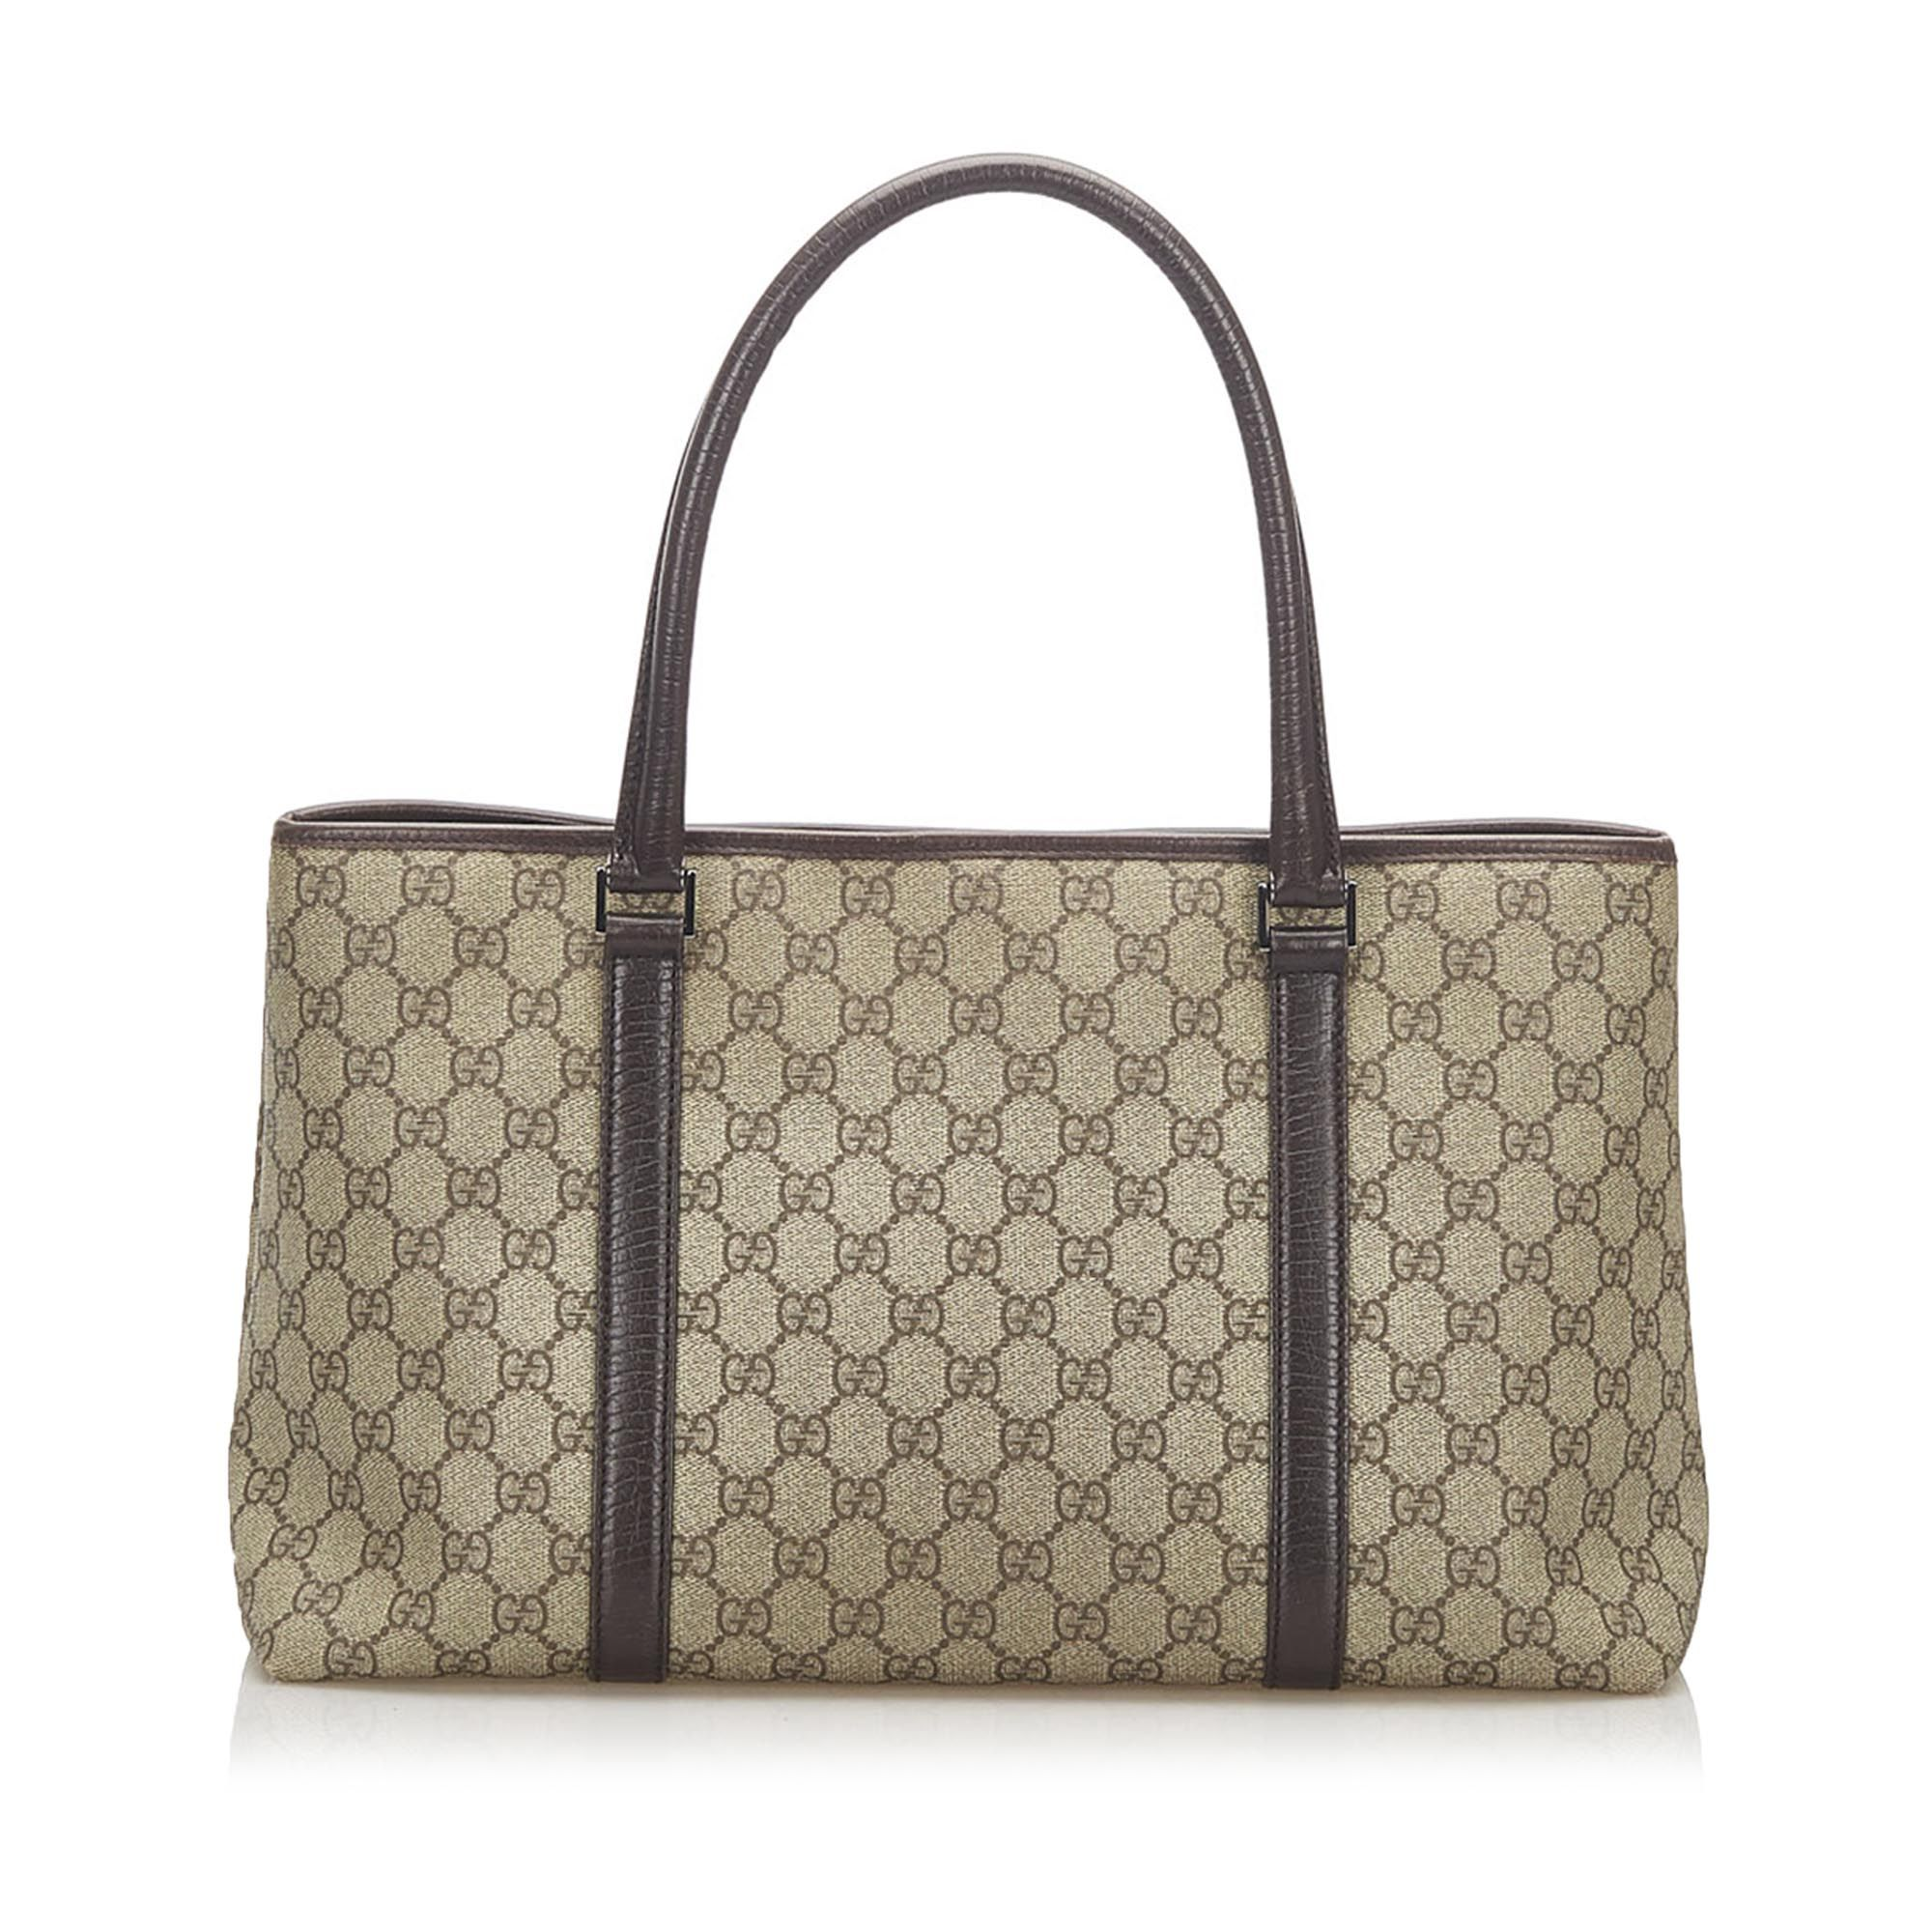 Vintage Gucci GG Supreme Tote Bag Brown